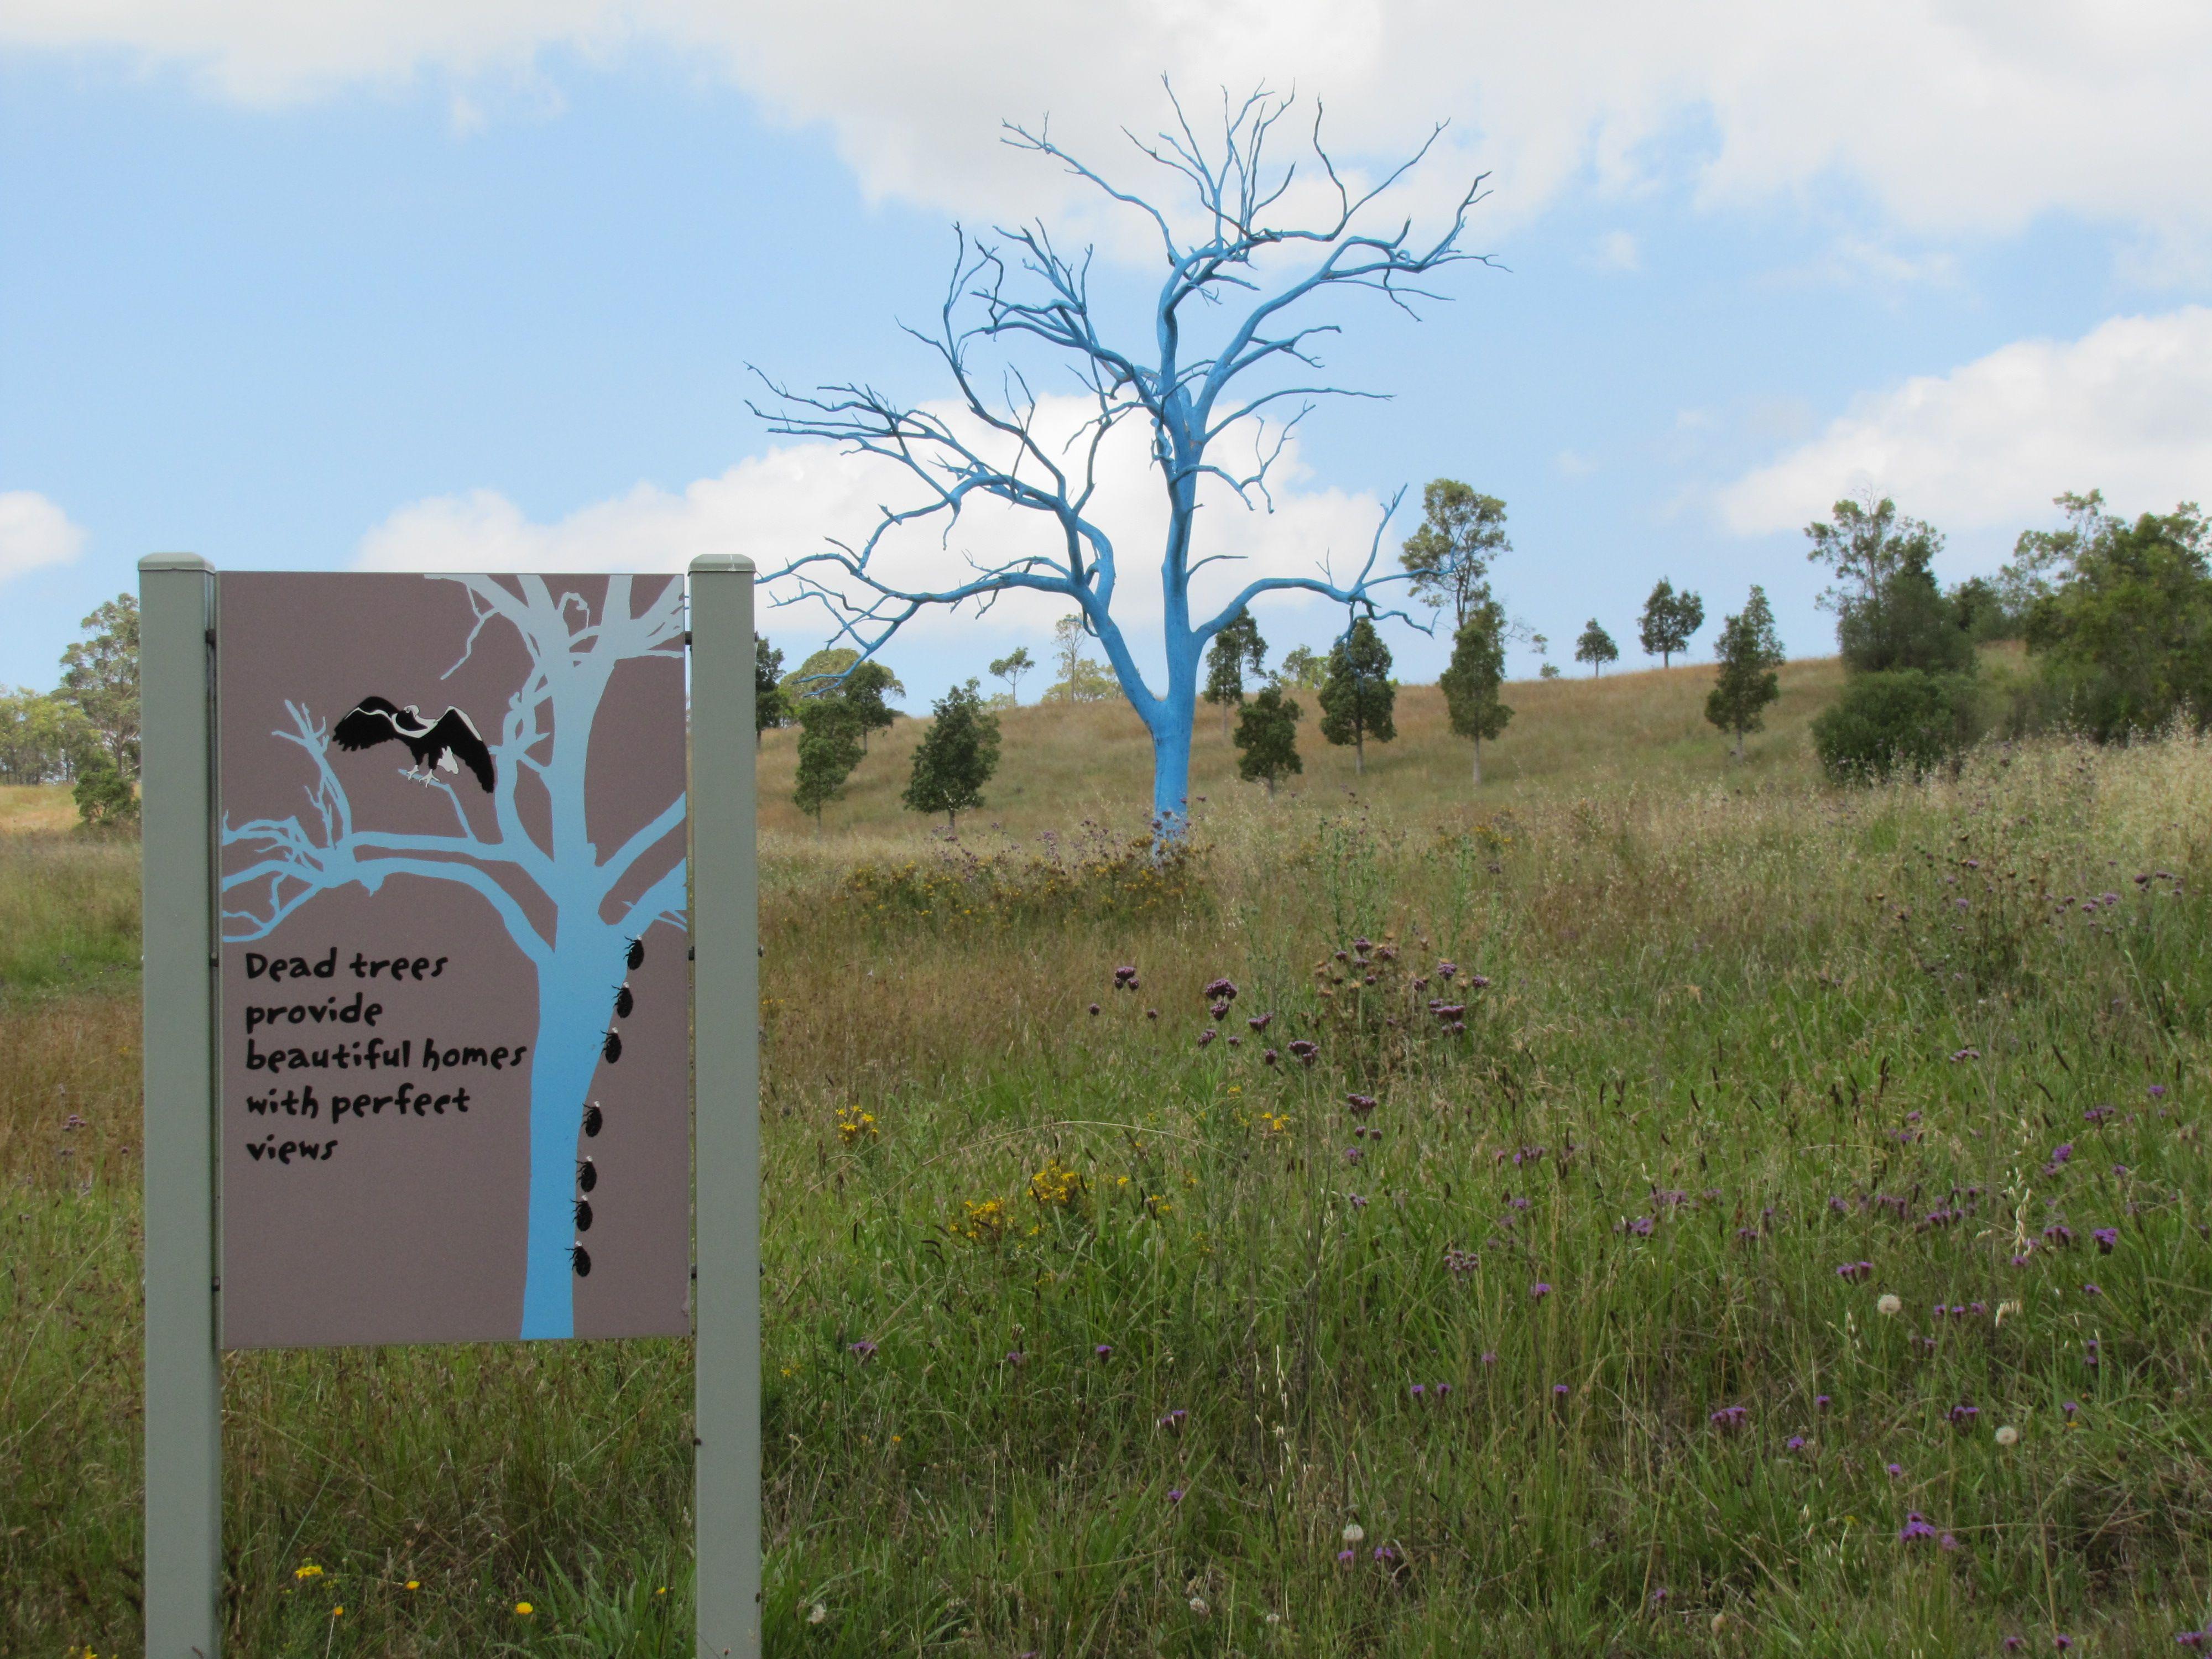 0ec0b04d52310f1fd9bbe0a61e2d50f0 - Where Is Mount Annan Botanic Gardens